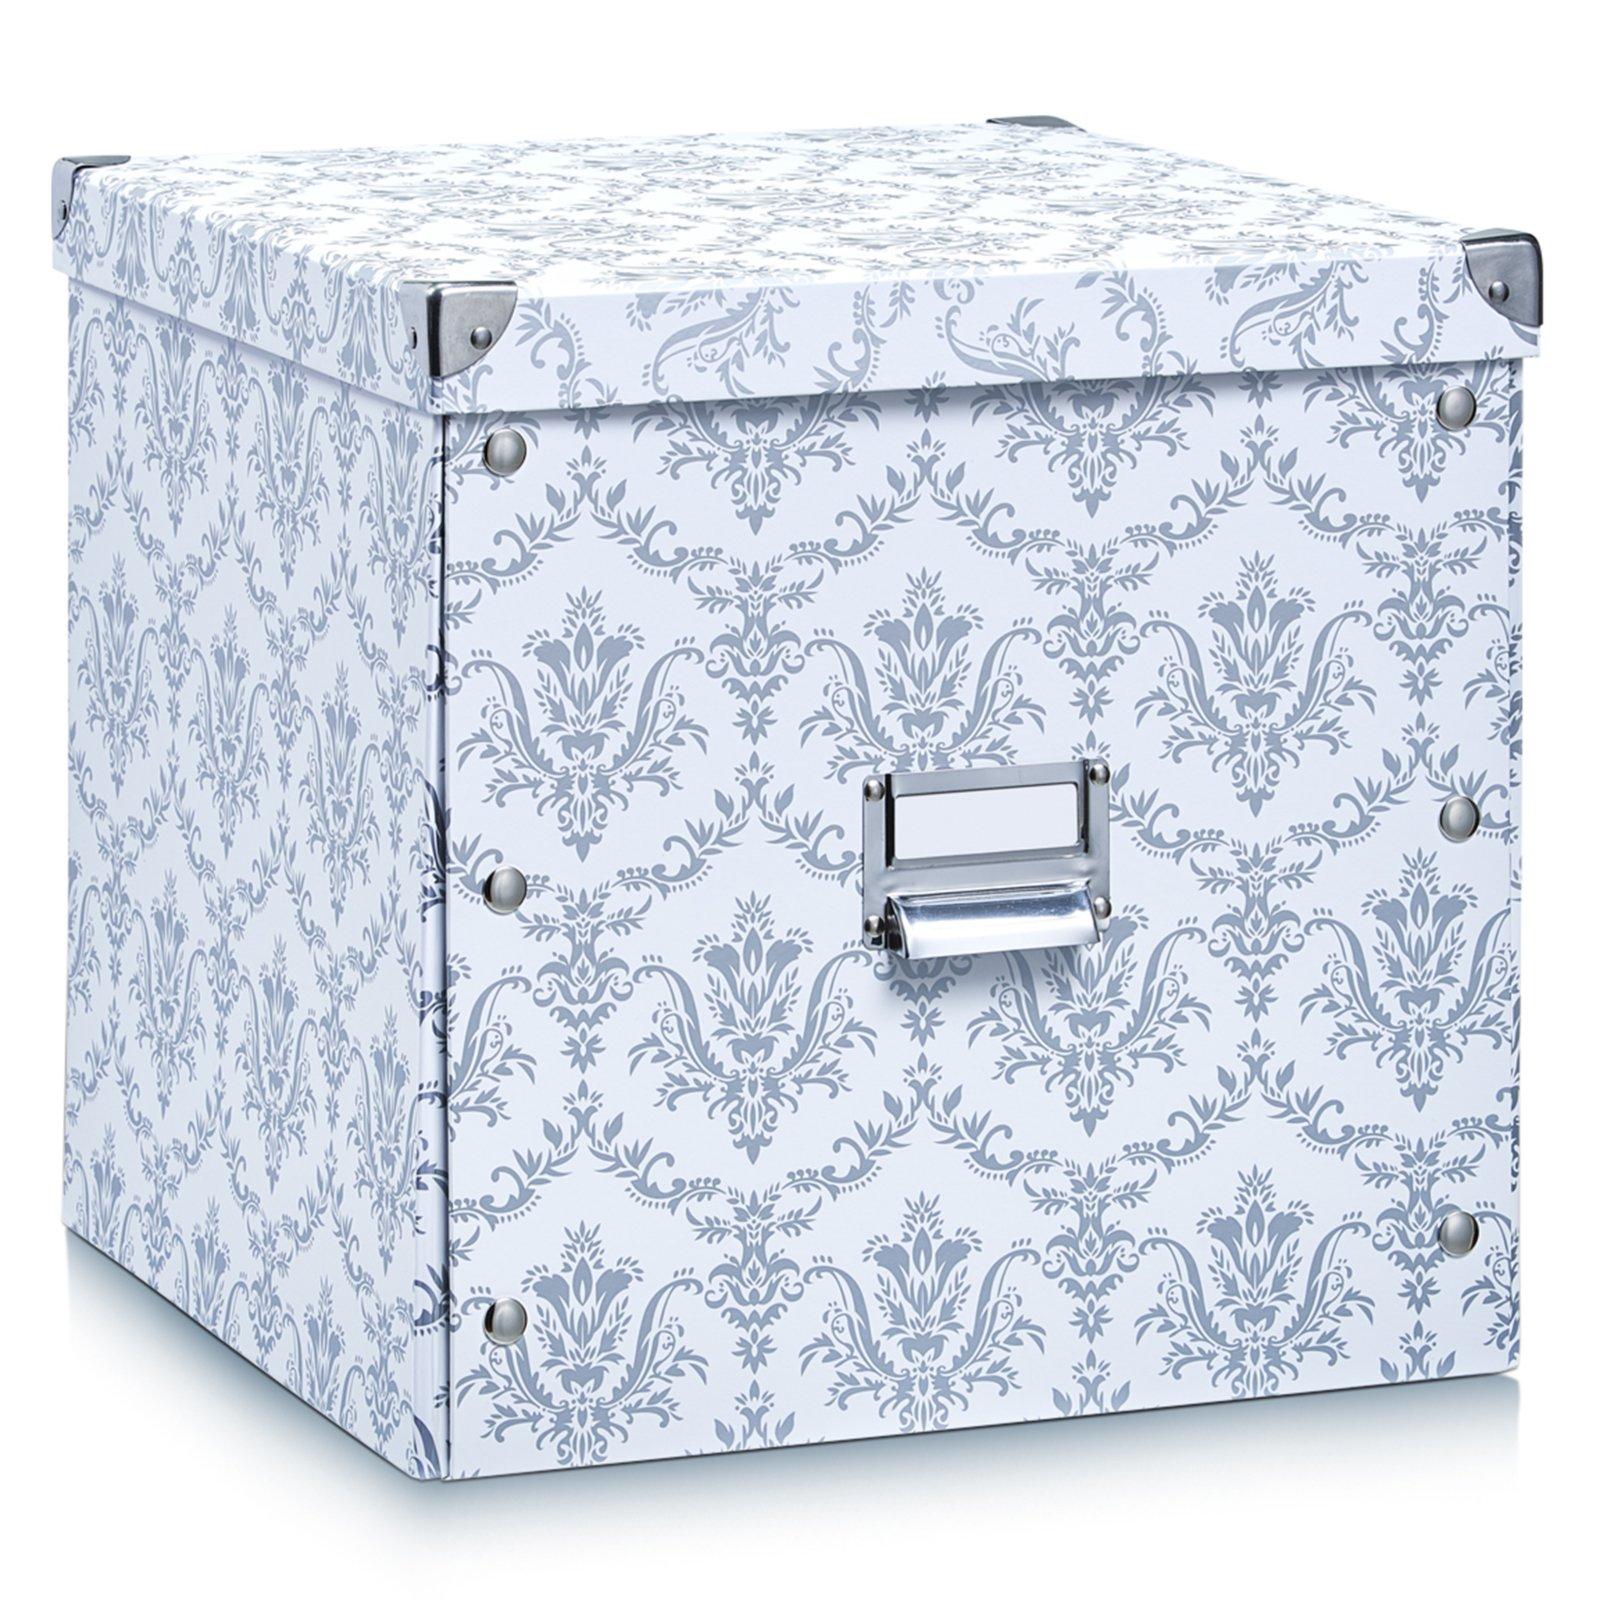 aufbewahrungsbox wei grau 33 5x33 cm dekorative. Black Bedroom Furniture Sets. Home Design Ideas